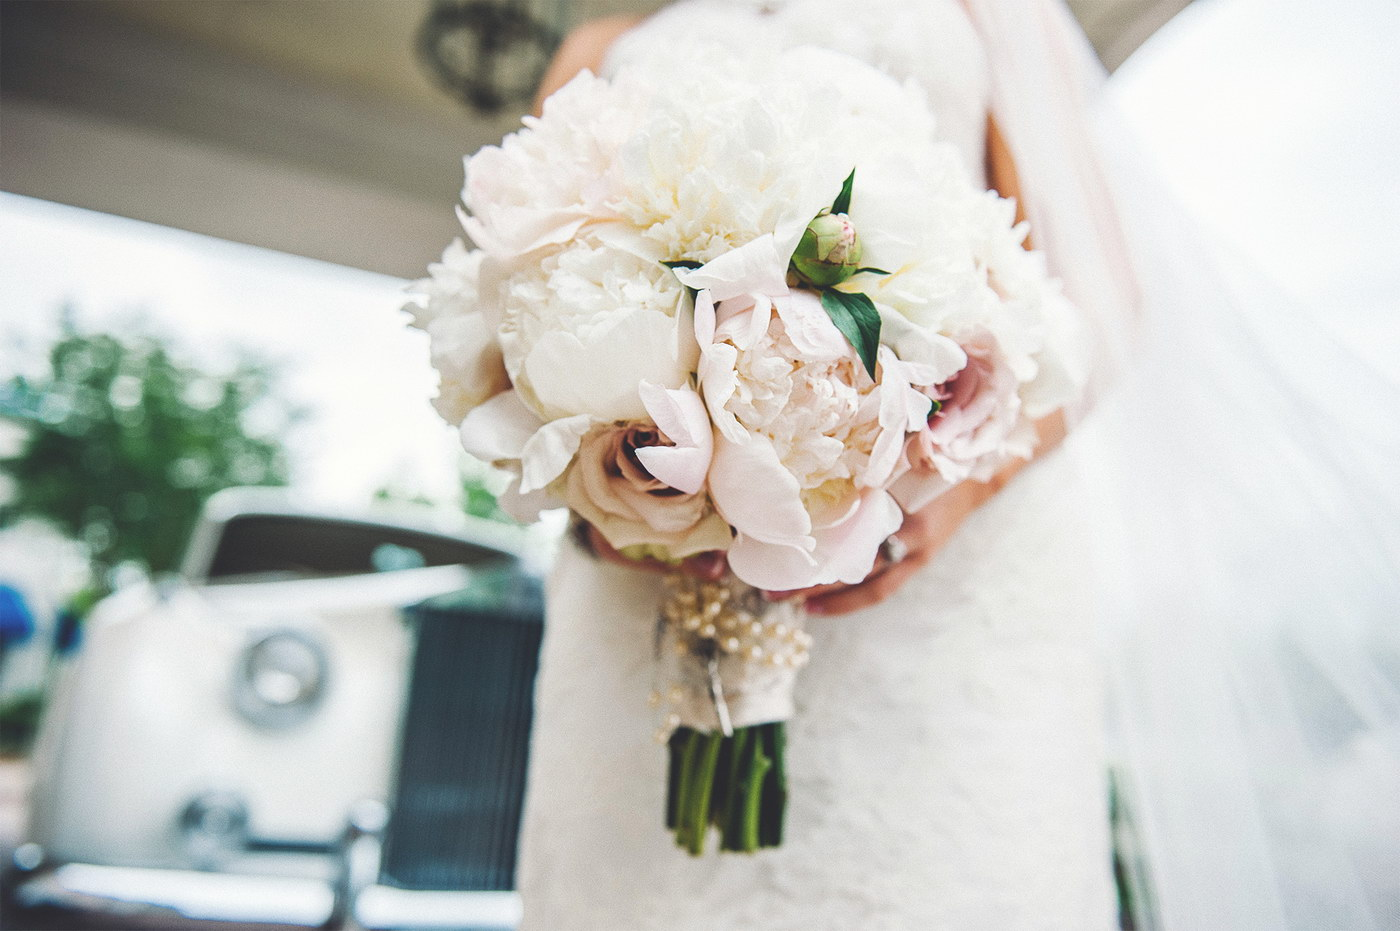 Schimbari sanatoase de facut inaintea nuntii